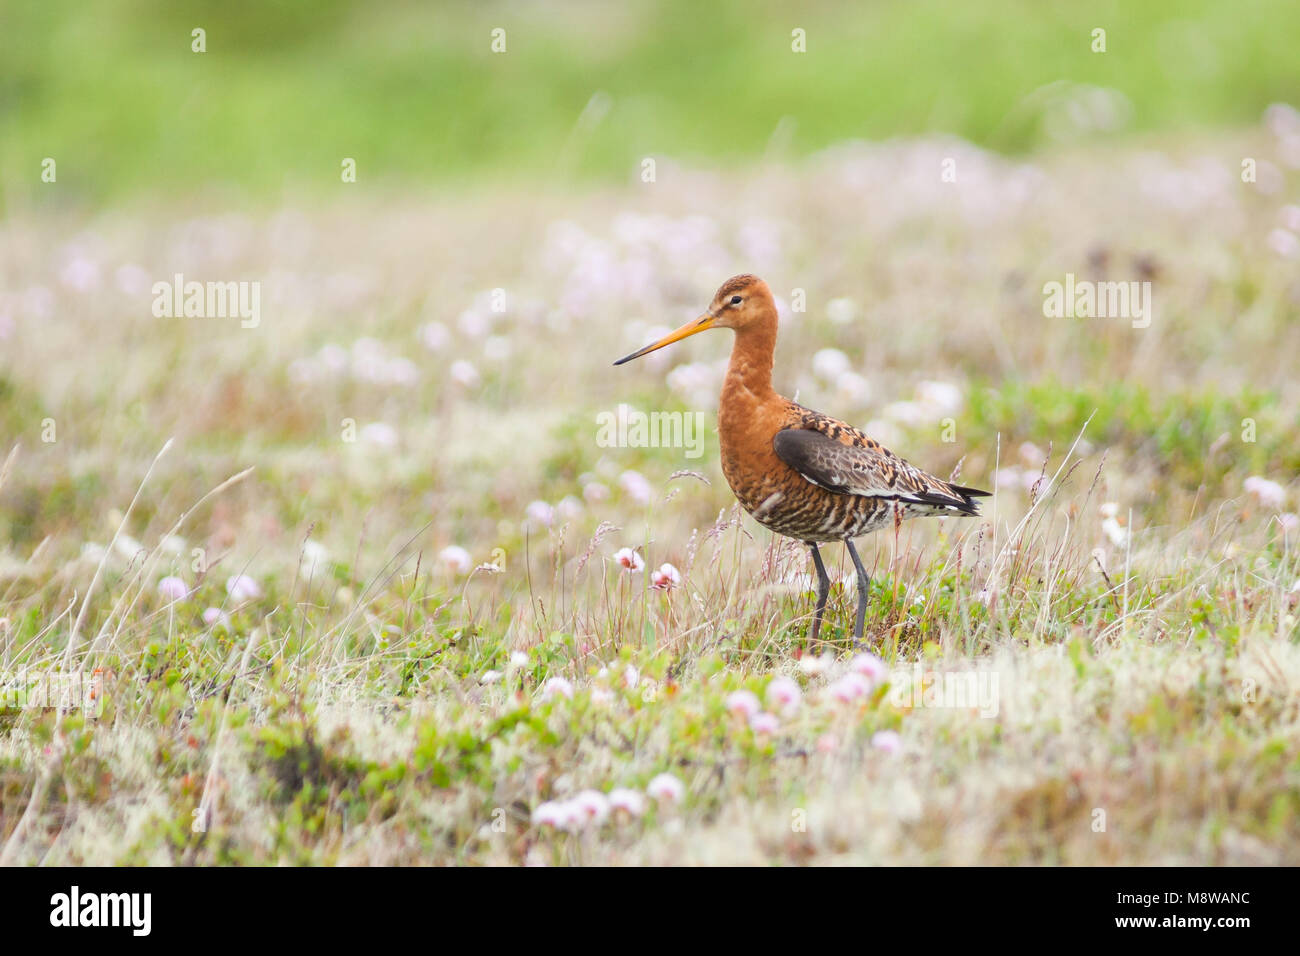 Bird image made by Ralph Martin Stock Photo